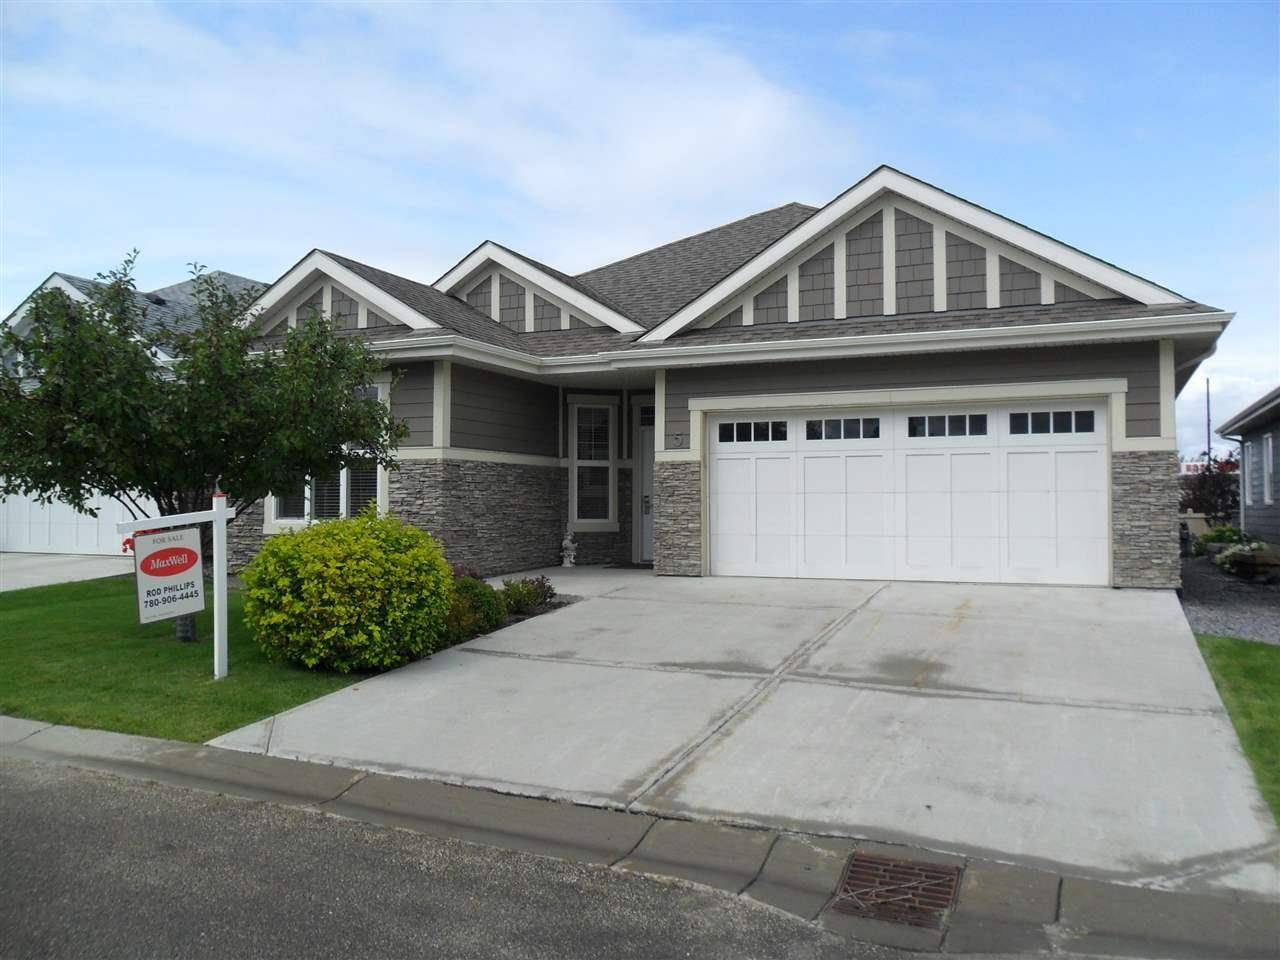 House for sale at 18343 Lessard Rd Nw Unit 5 Edmonton Alberta - MLS: E4173798